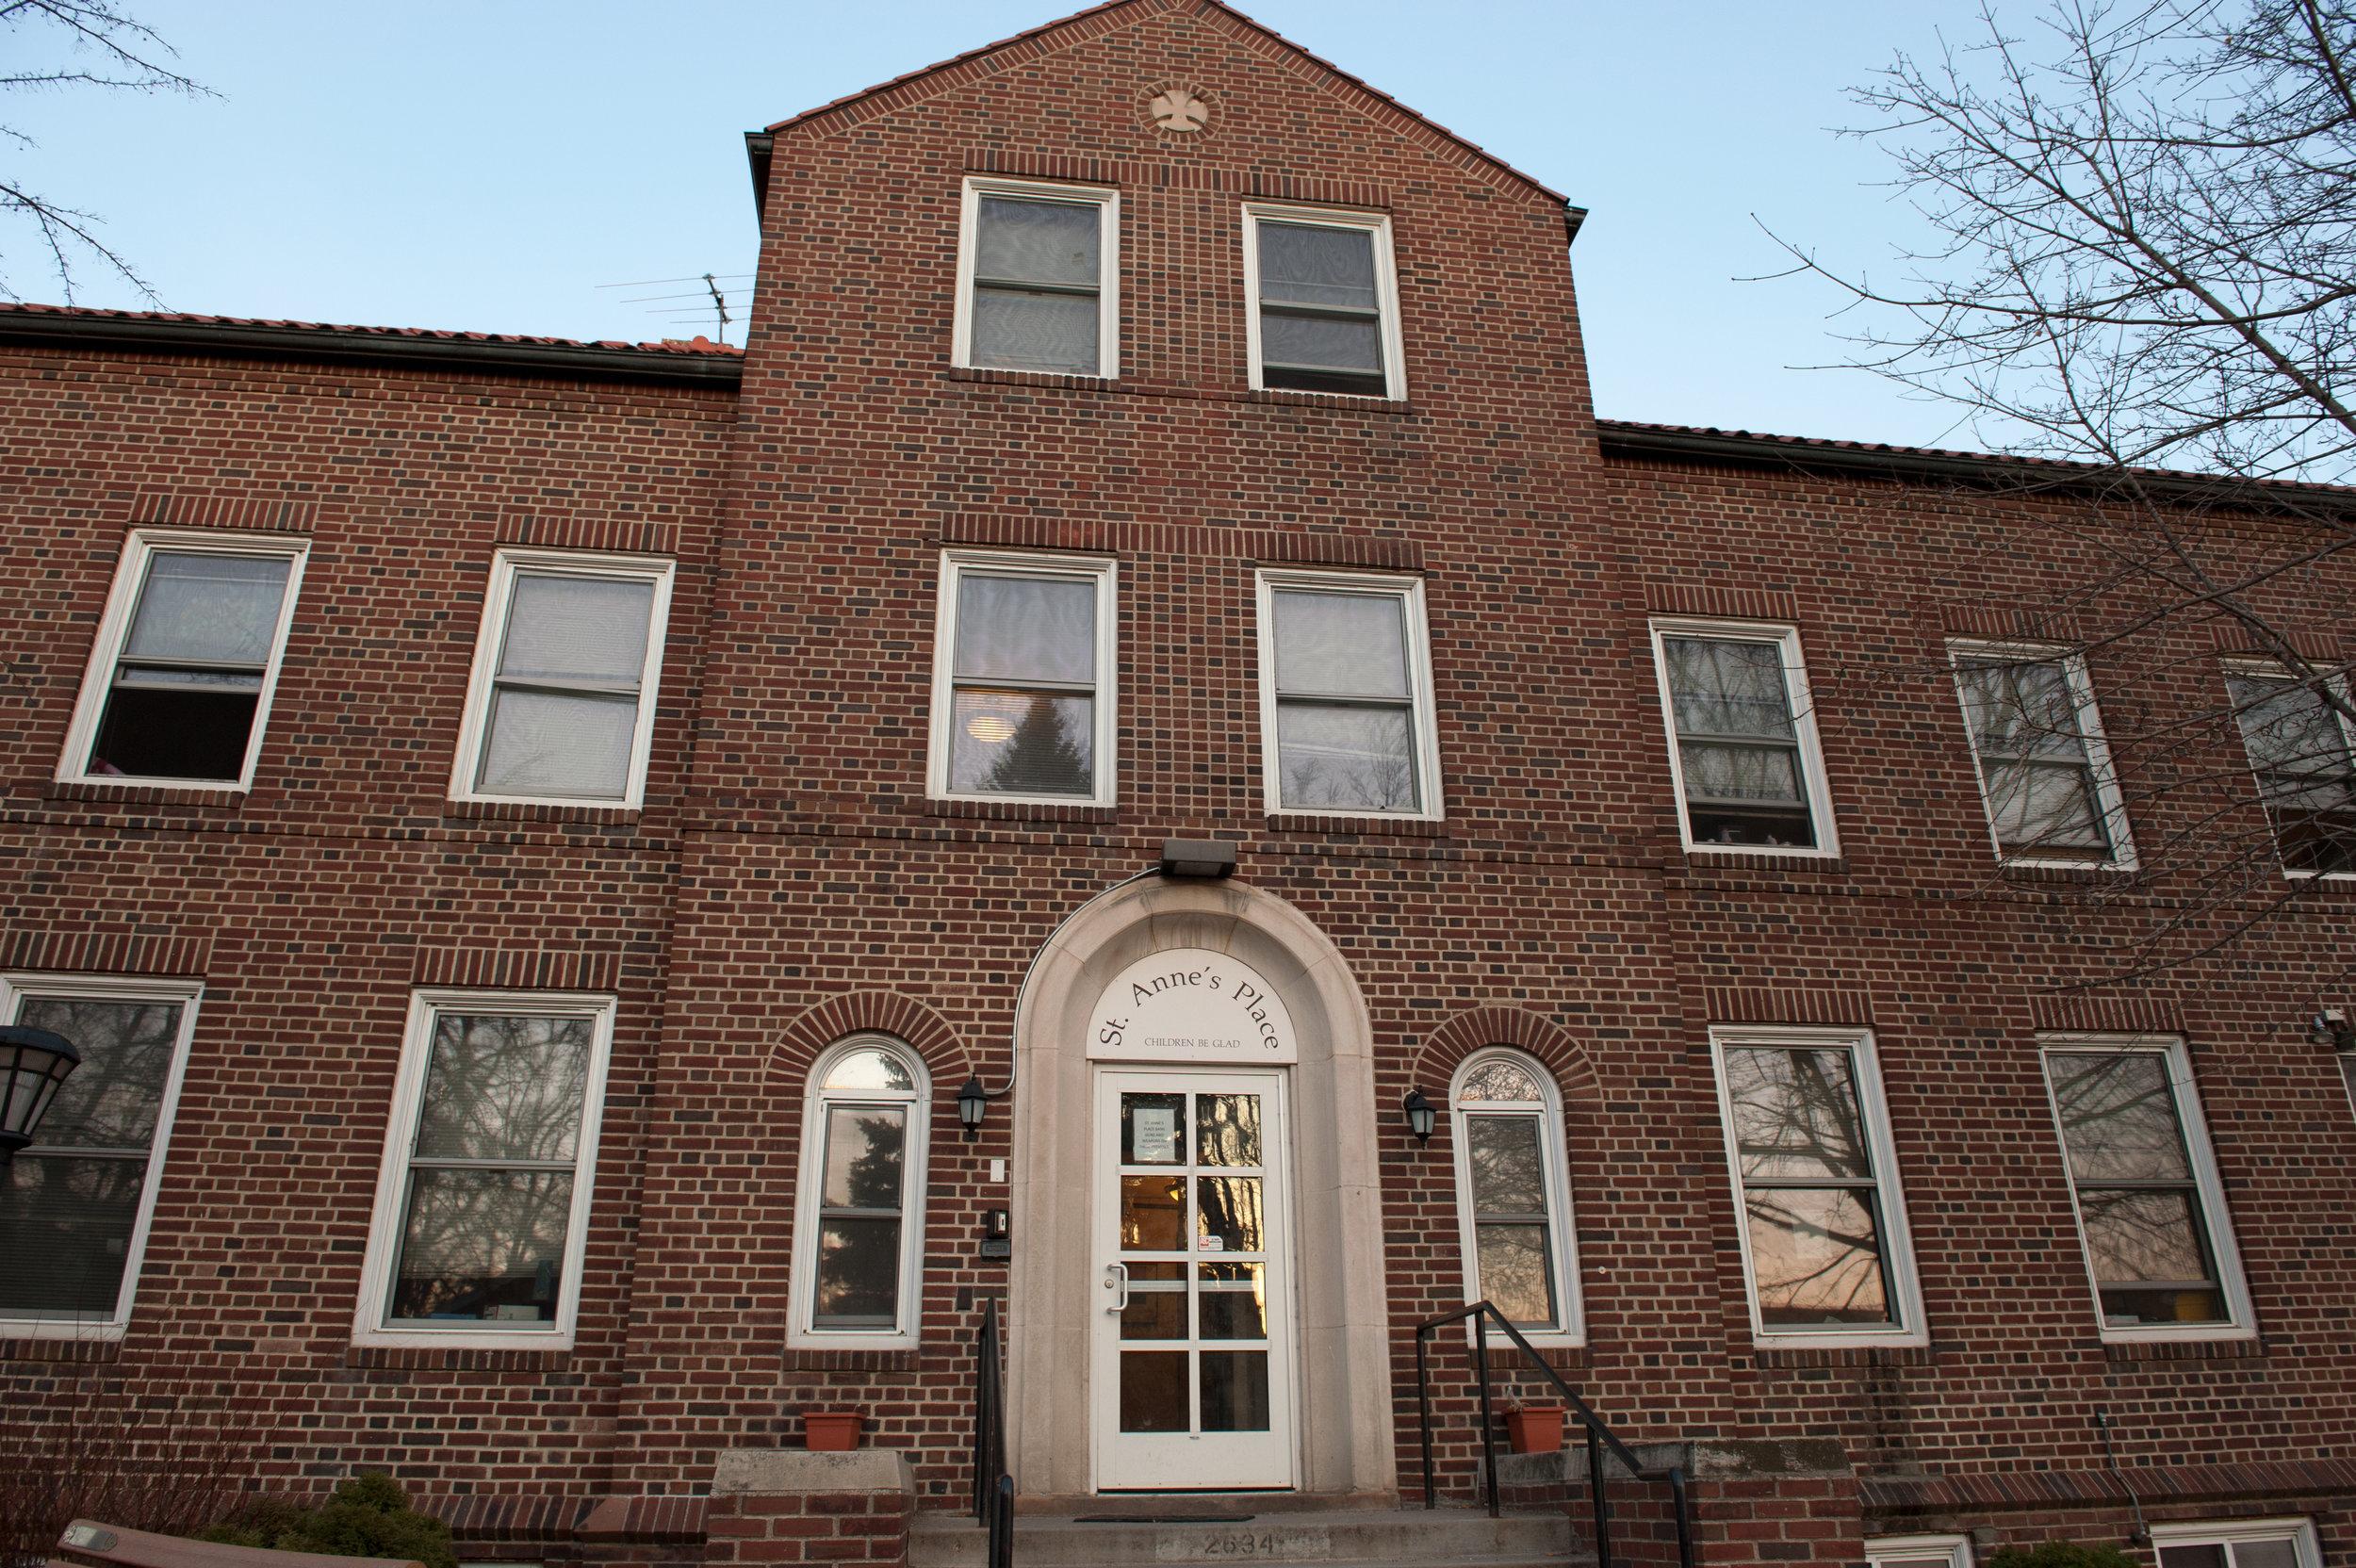 St. Anne's Place of Haven Housing Minneapolis St. Paul